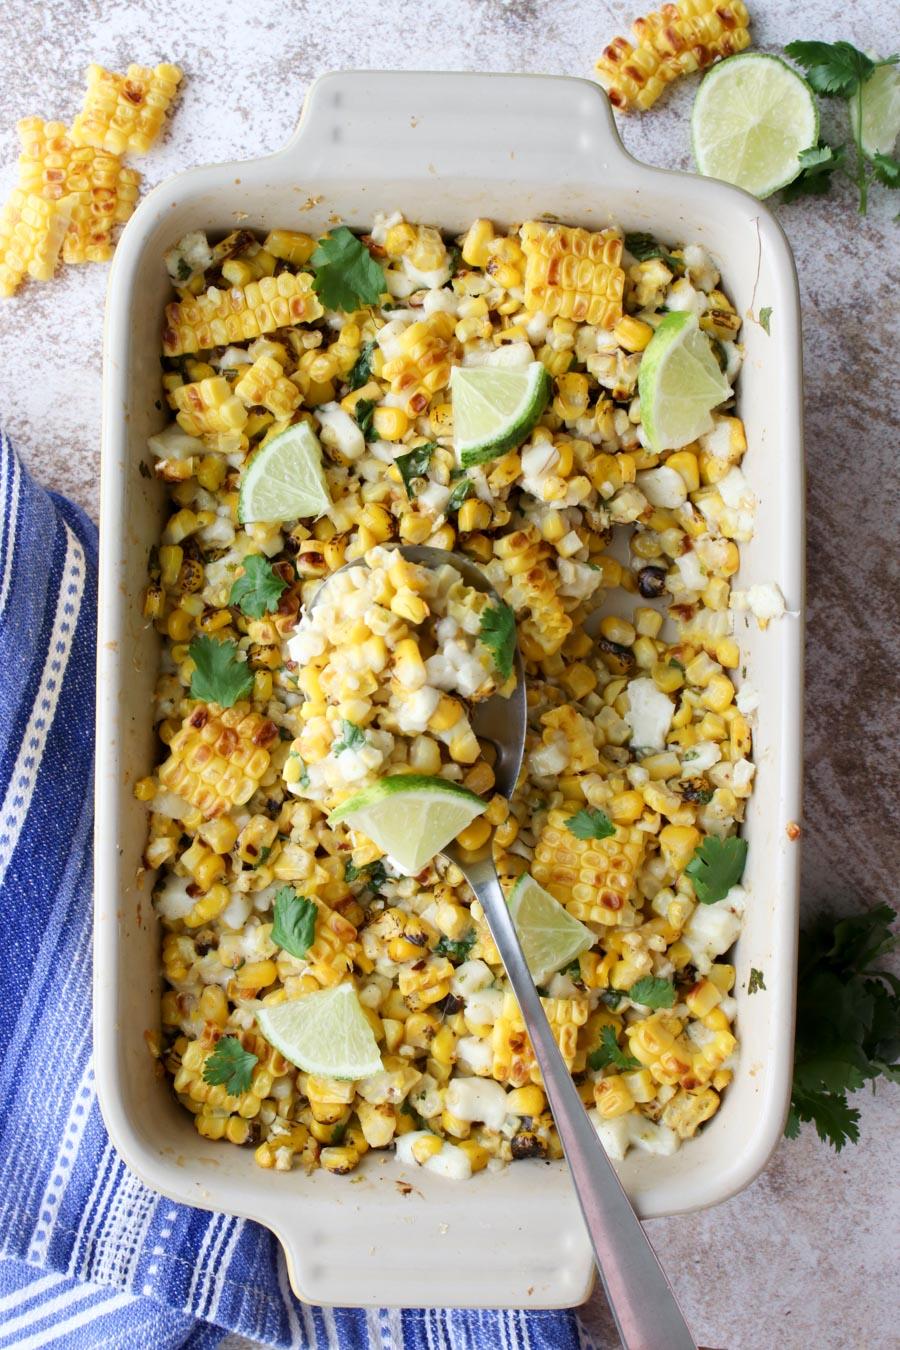 Mexican Street Corn Casserole in a casserole dish